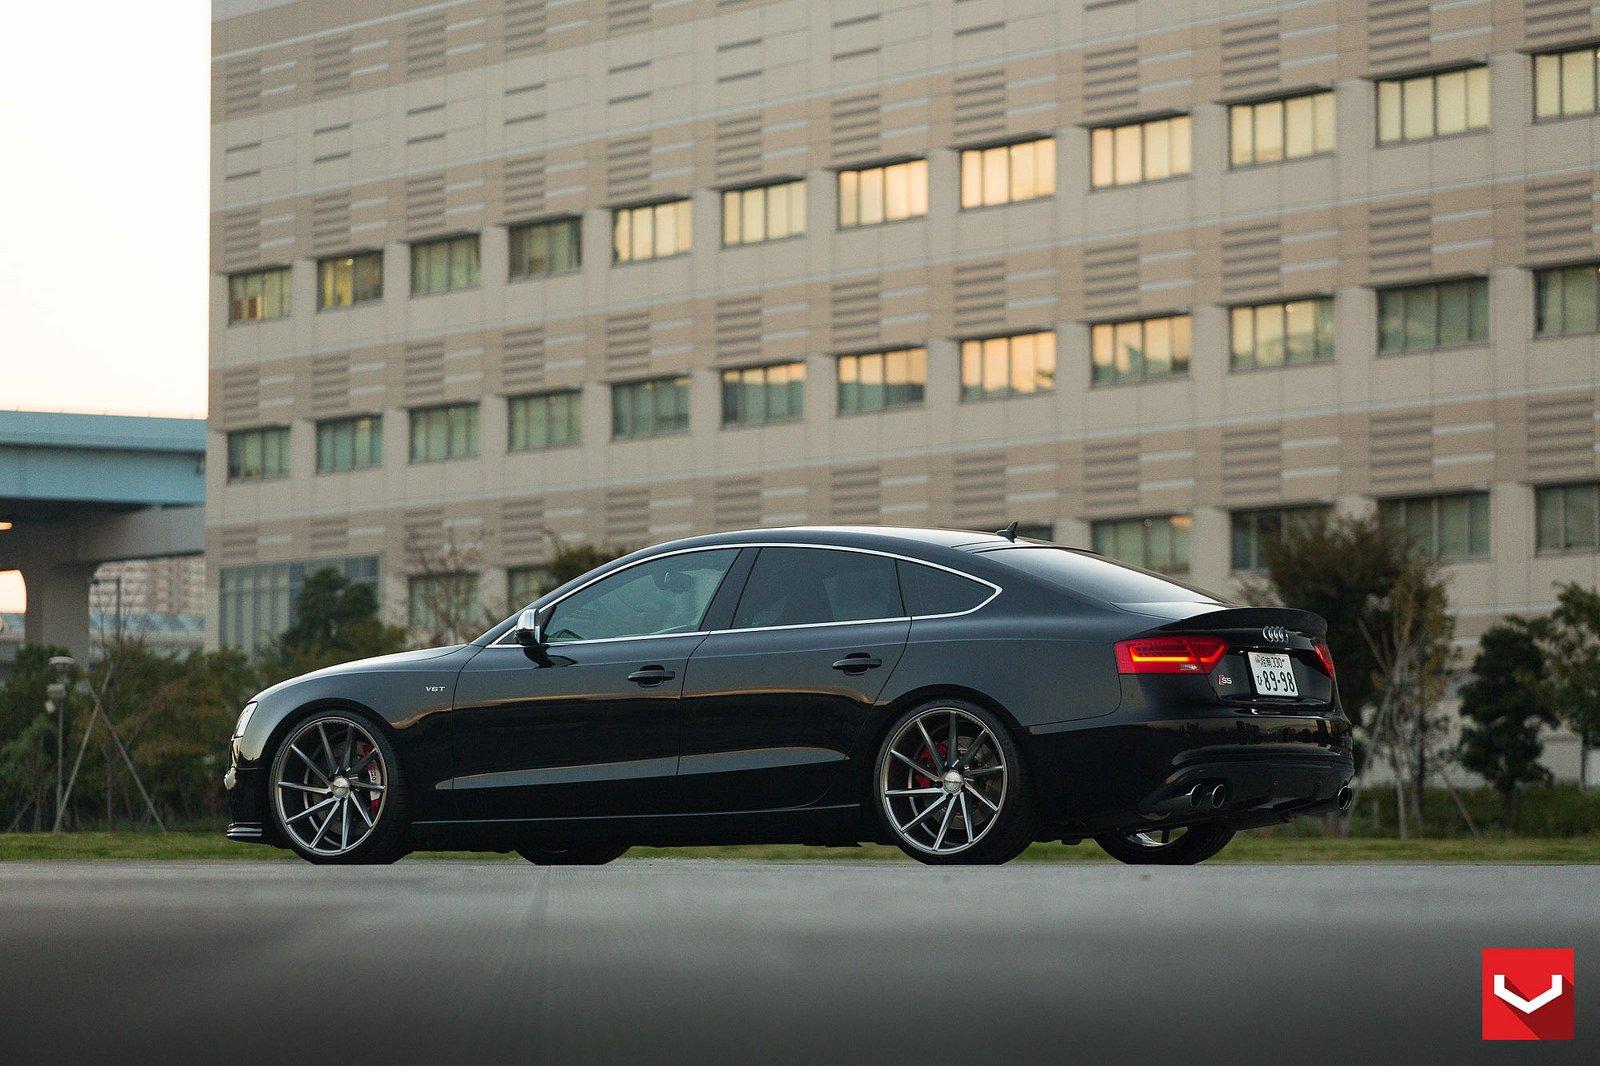 Vossen Wheels Audi S5 Sportback Black Tuning Cars